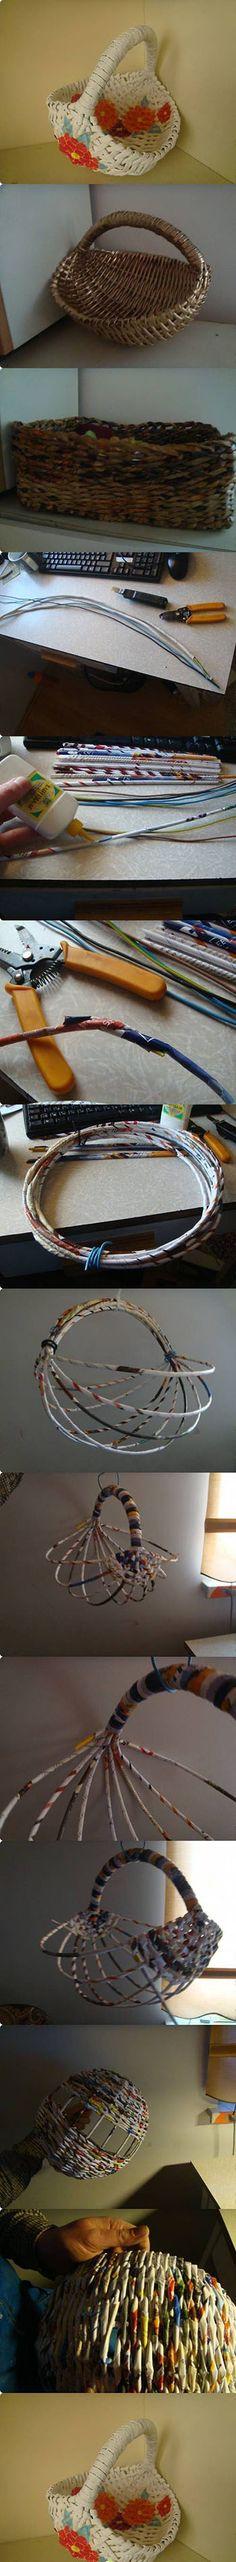 Diy Beautiful Basket   DIY & Crafts Tutorials